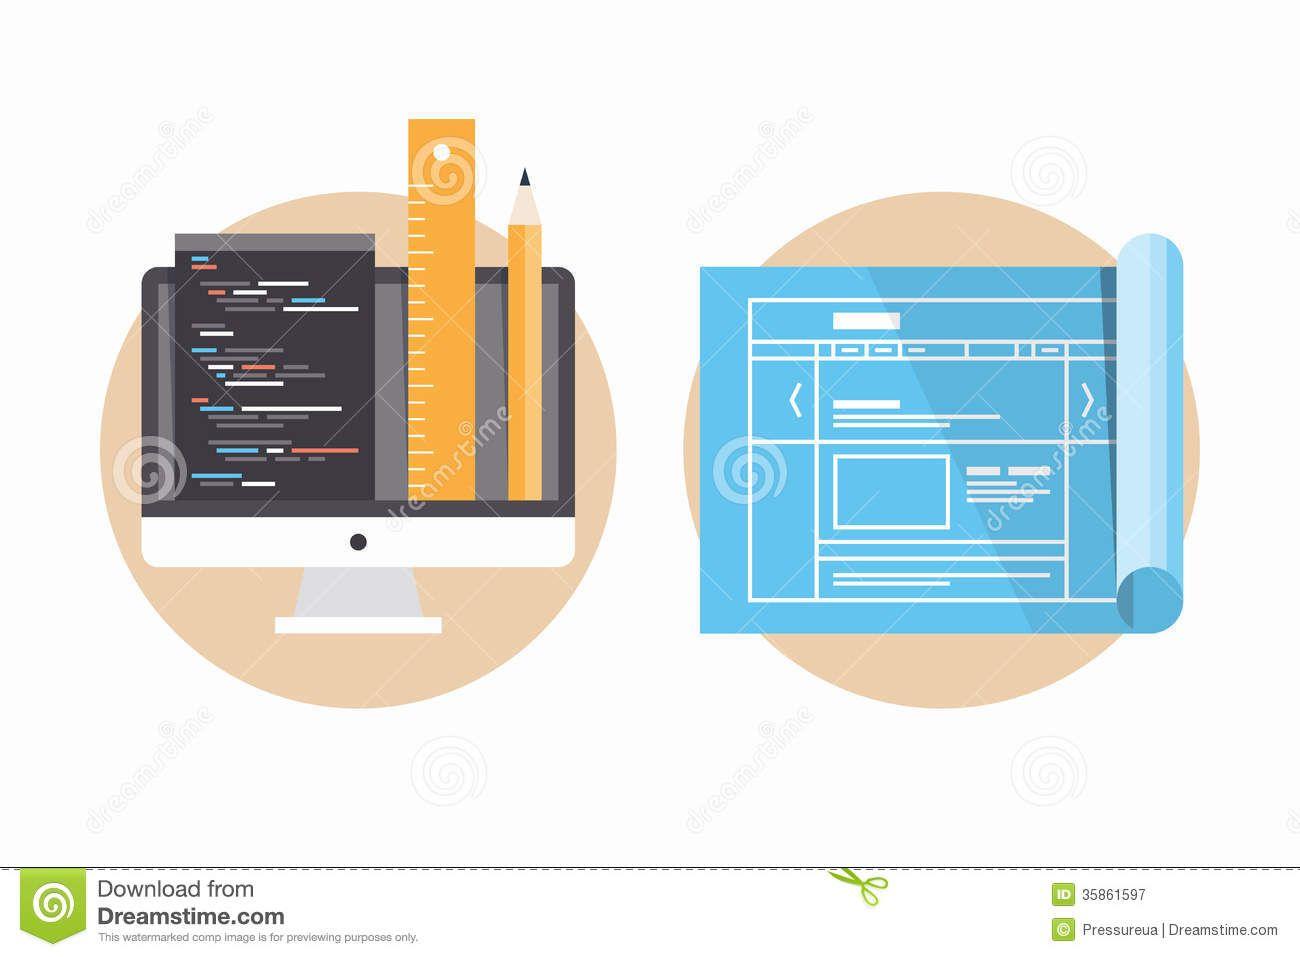 Website programming development icons flat design modern website programming and development icons by bloomua flat design modern vector illustration icons set of website programming and coding web page blueprint malvernweather Choice Image